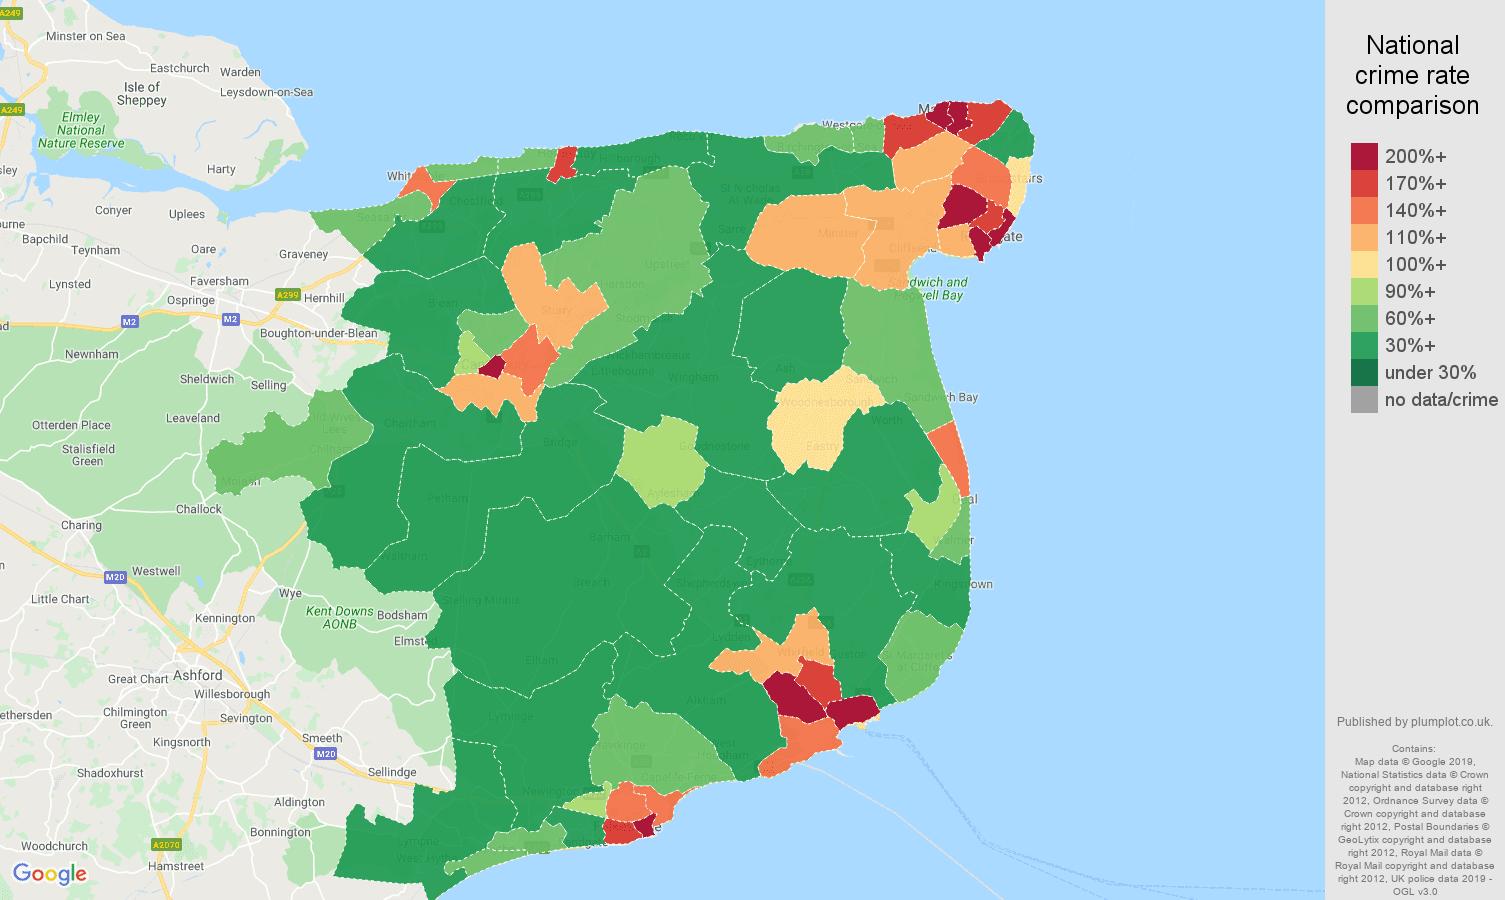 Canterbury public order crime rate comparison map